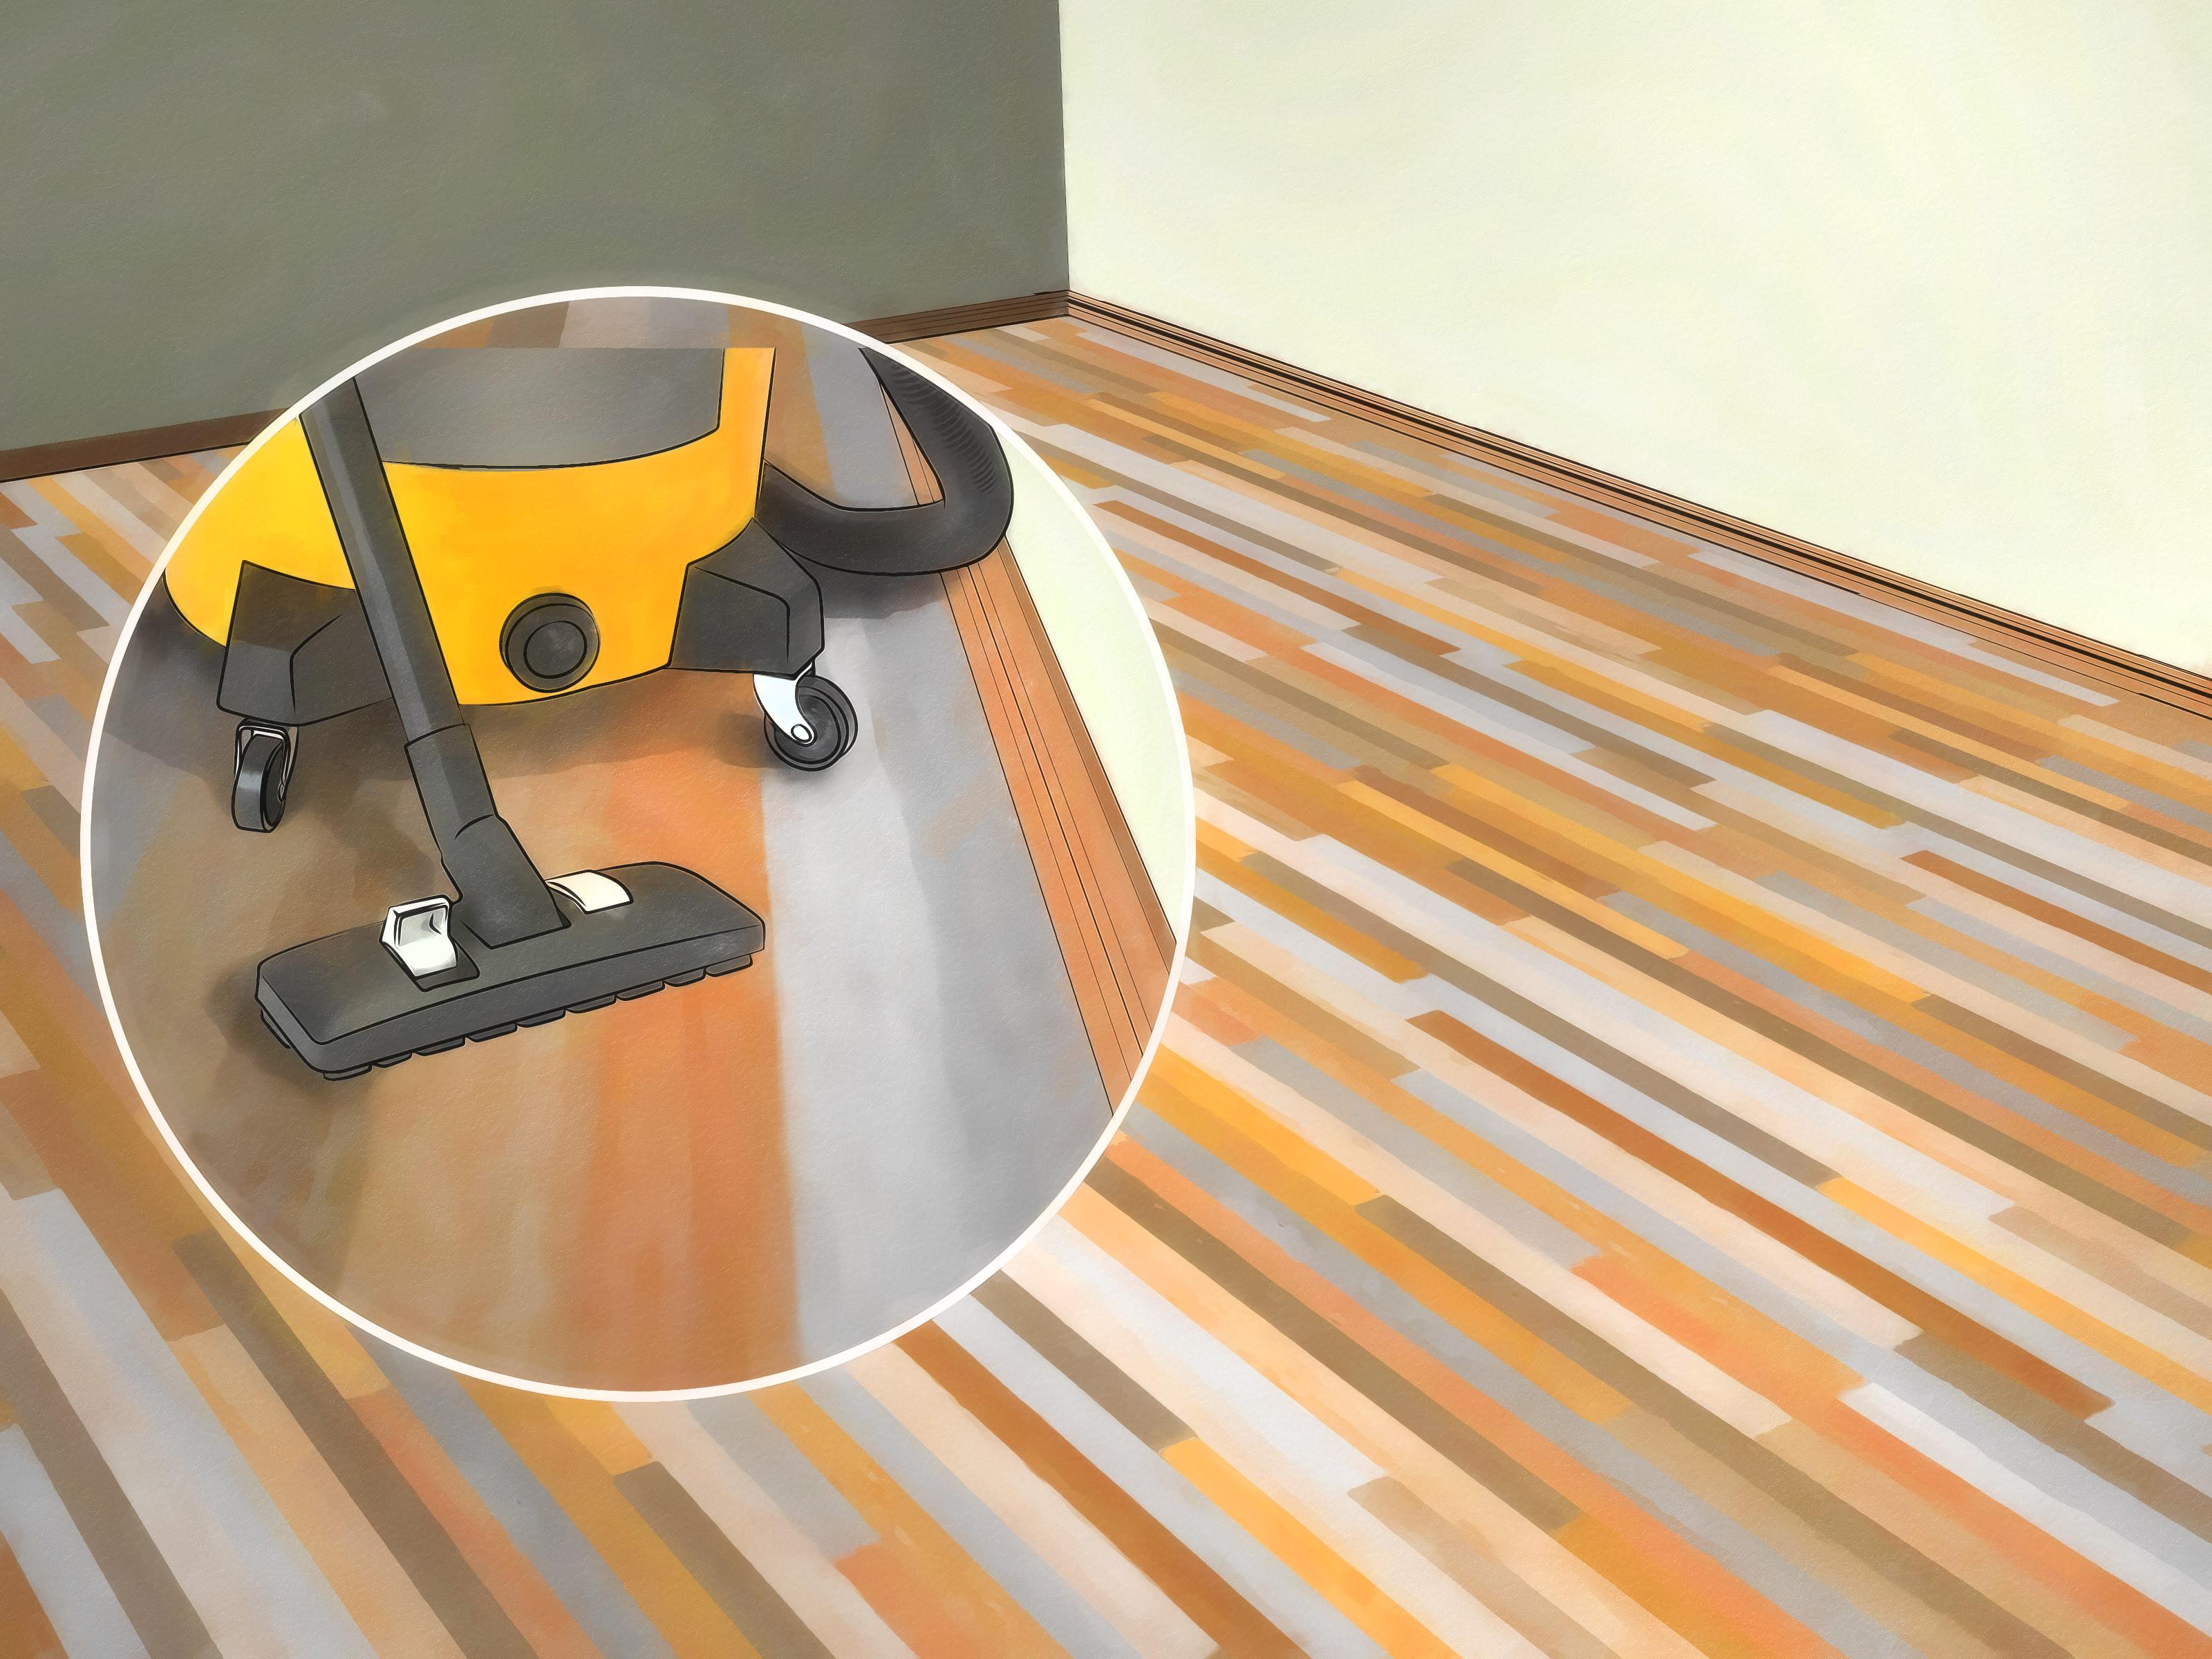 how to install engineered hardwood floor over plywood of how to sand hardwood floors with pictures wikihow in sand hardwood floors step 22